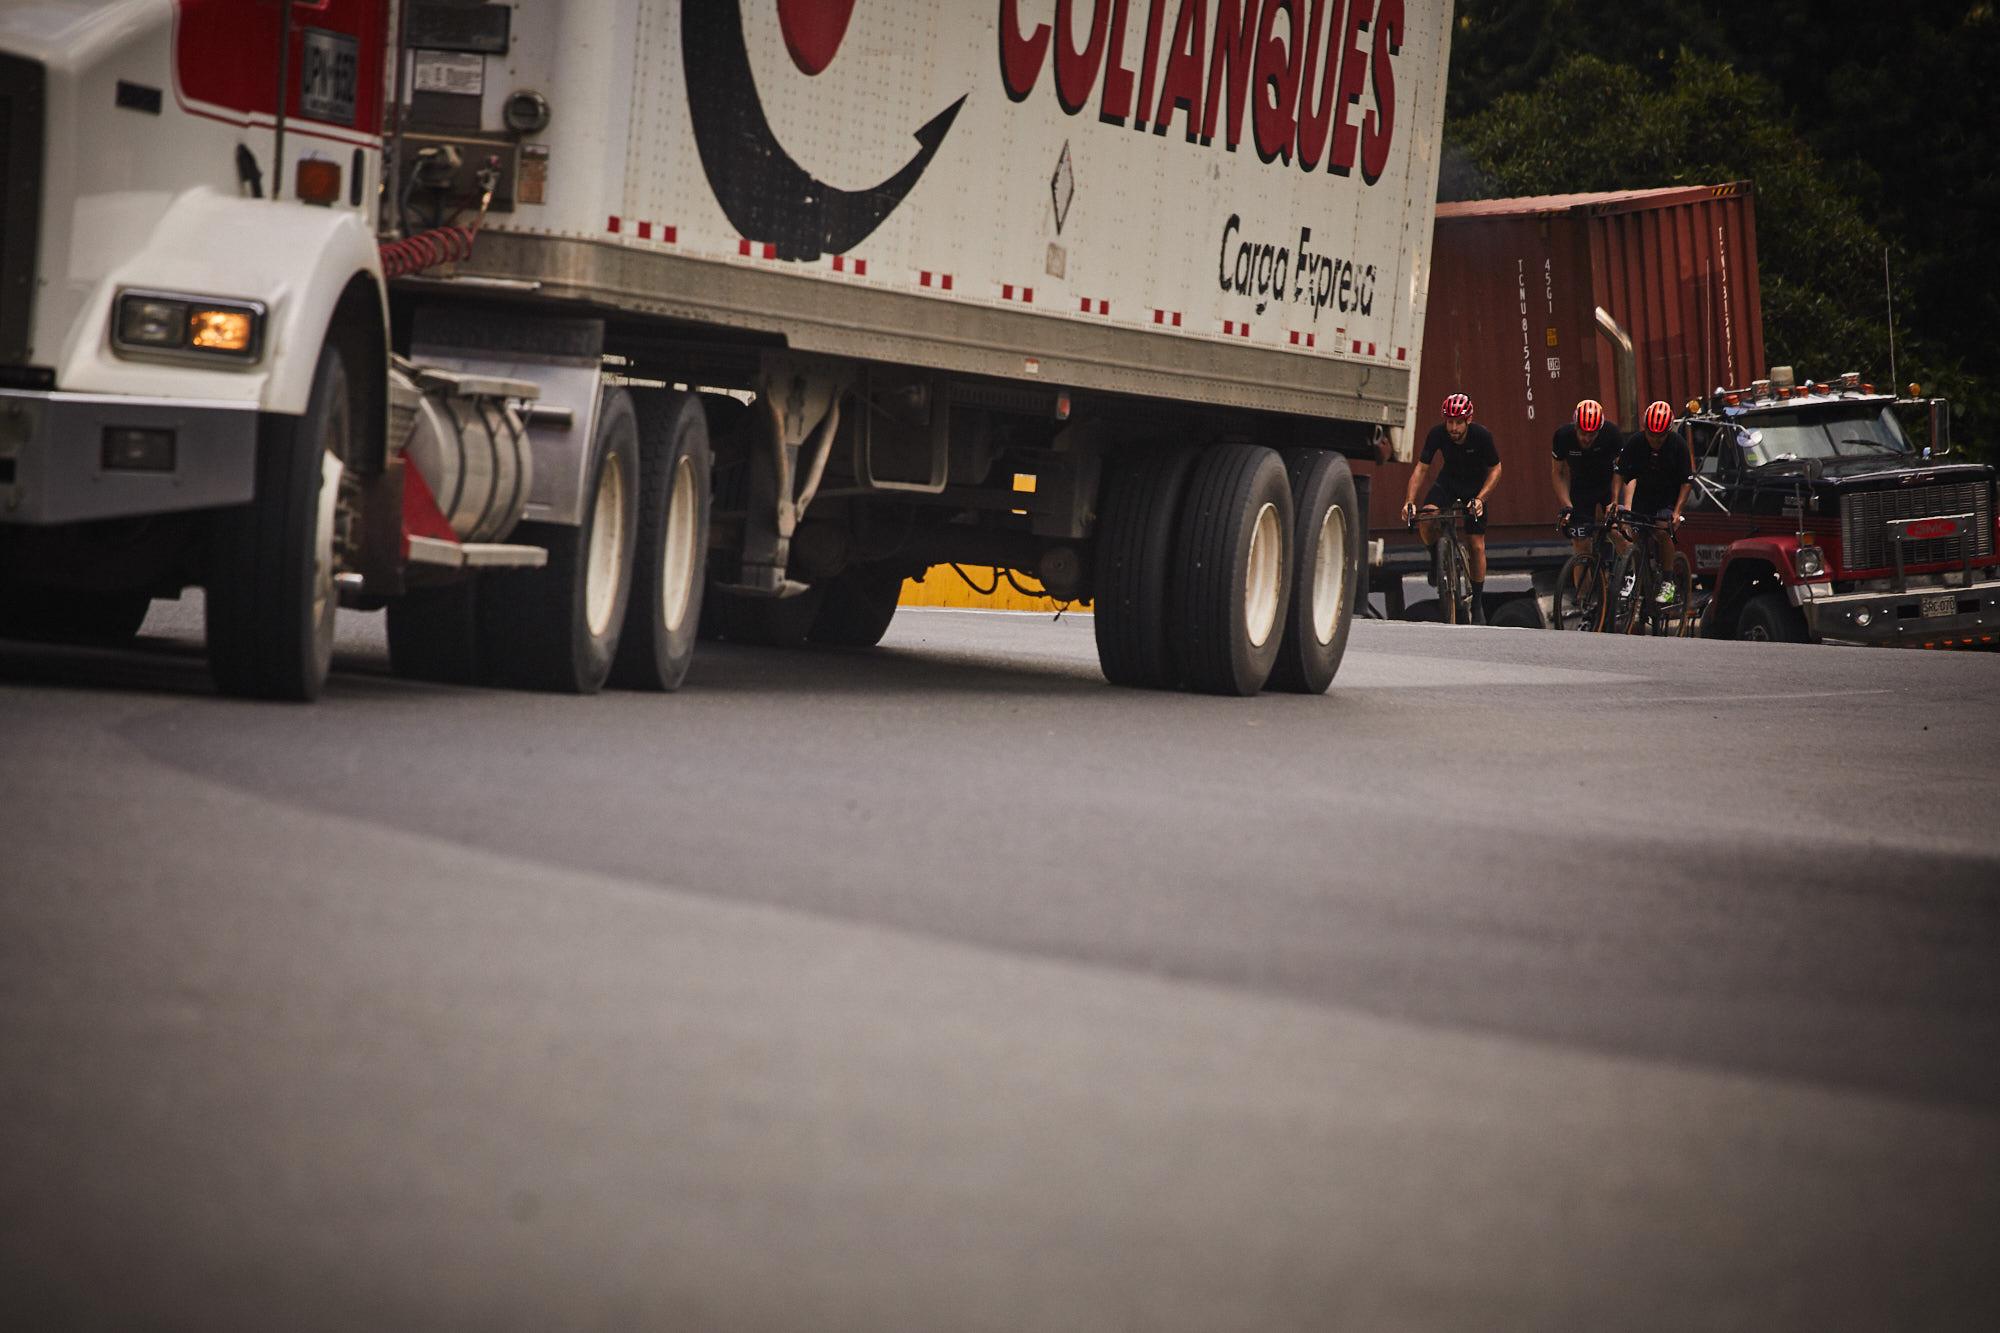 LOWRES-RADRACE-COLUMBIA-2018-CARLOS-3037.jpg